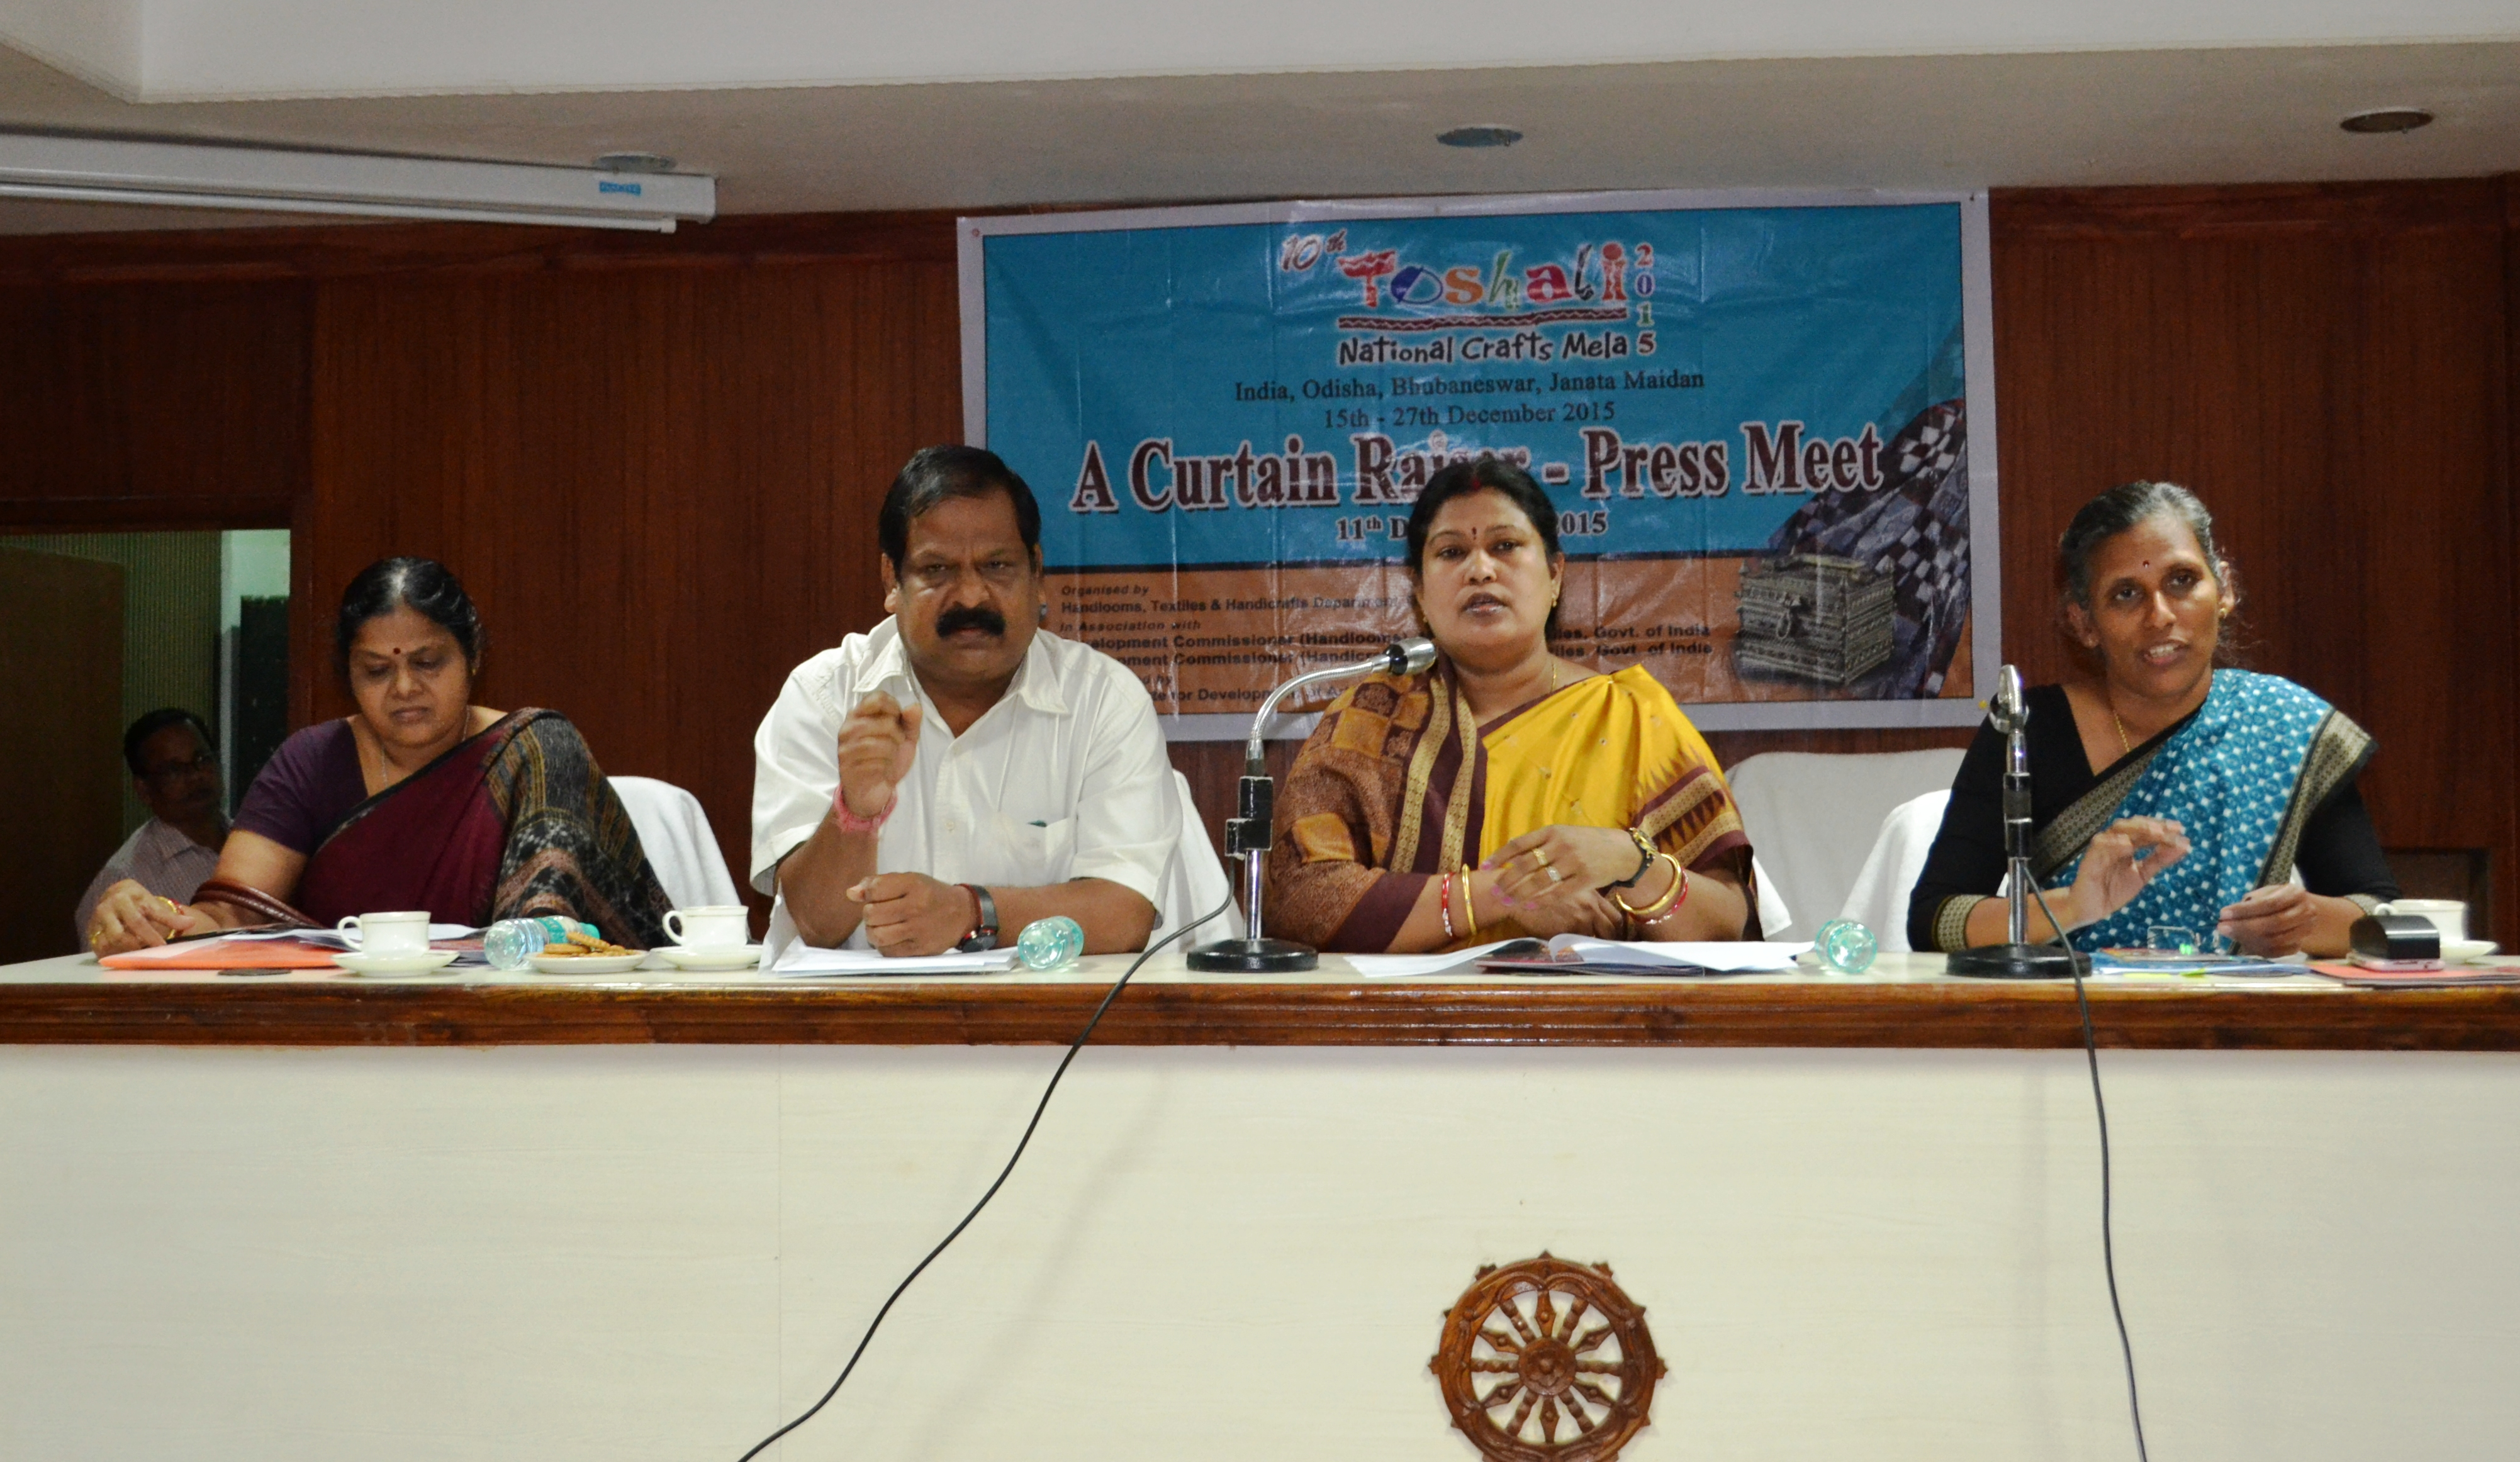 Press meet by Toshali National Crafts Mala 2015